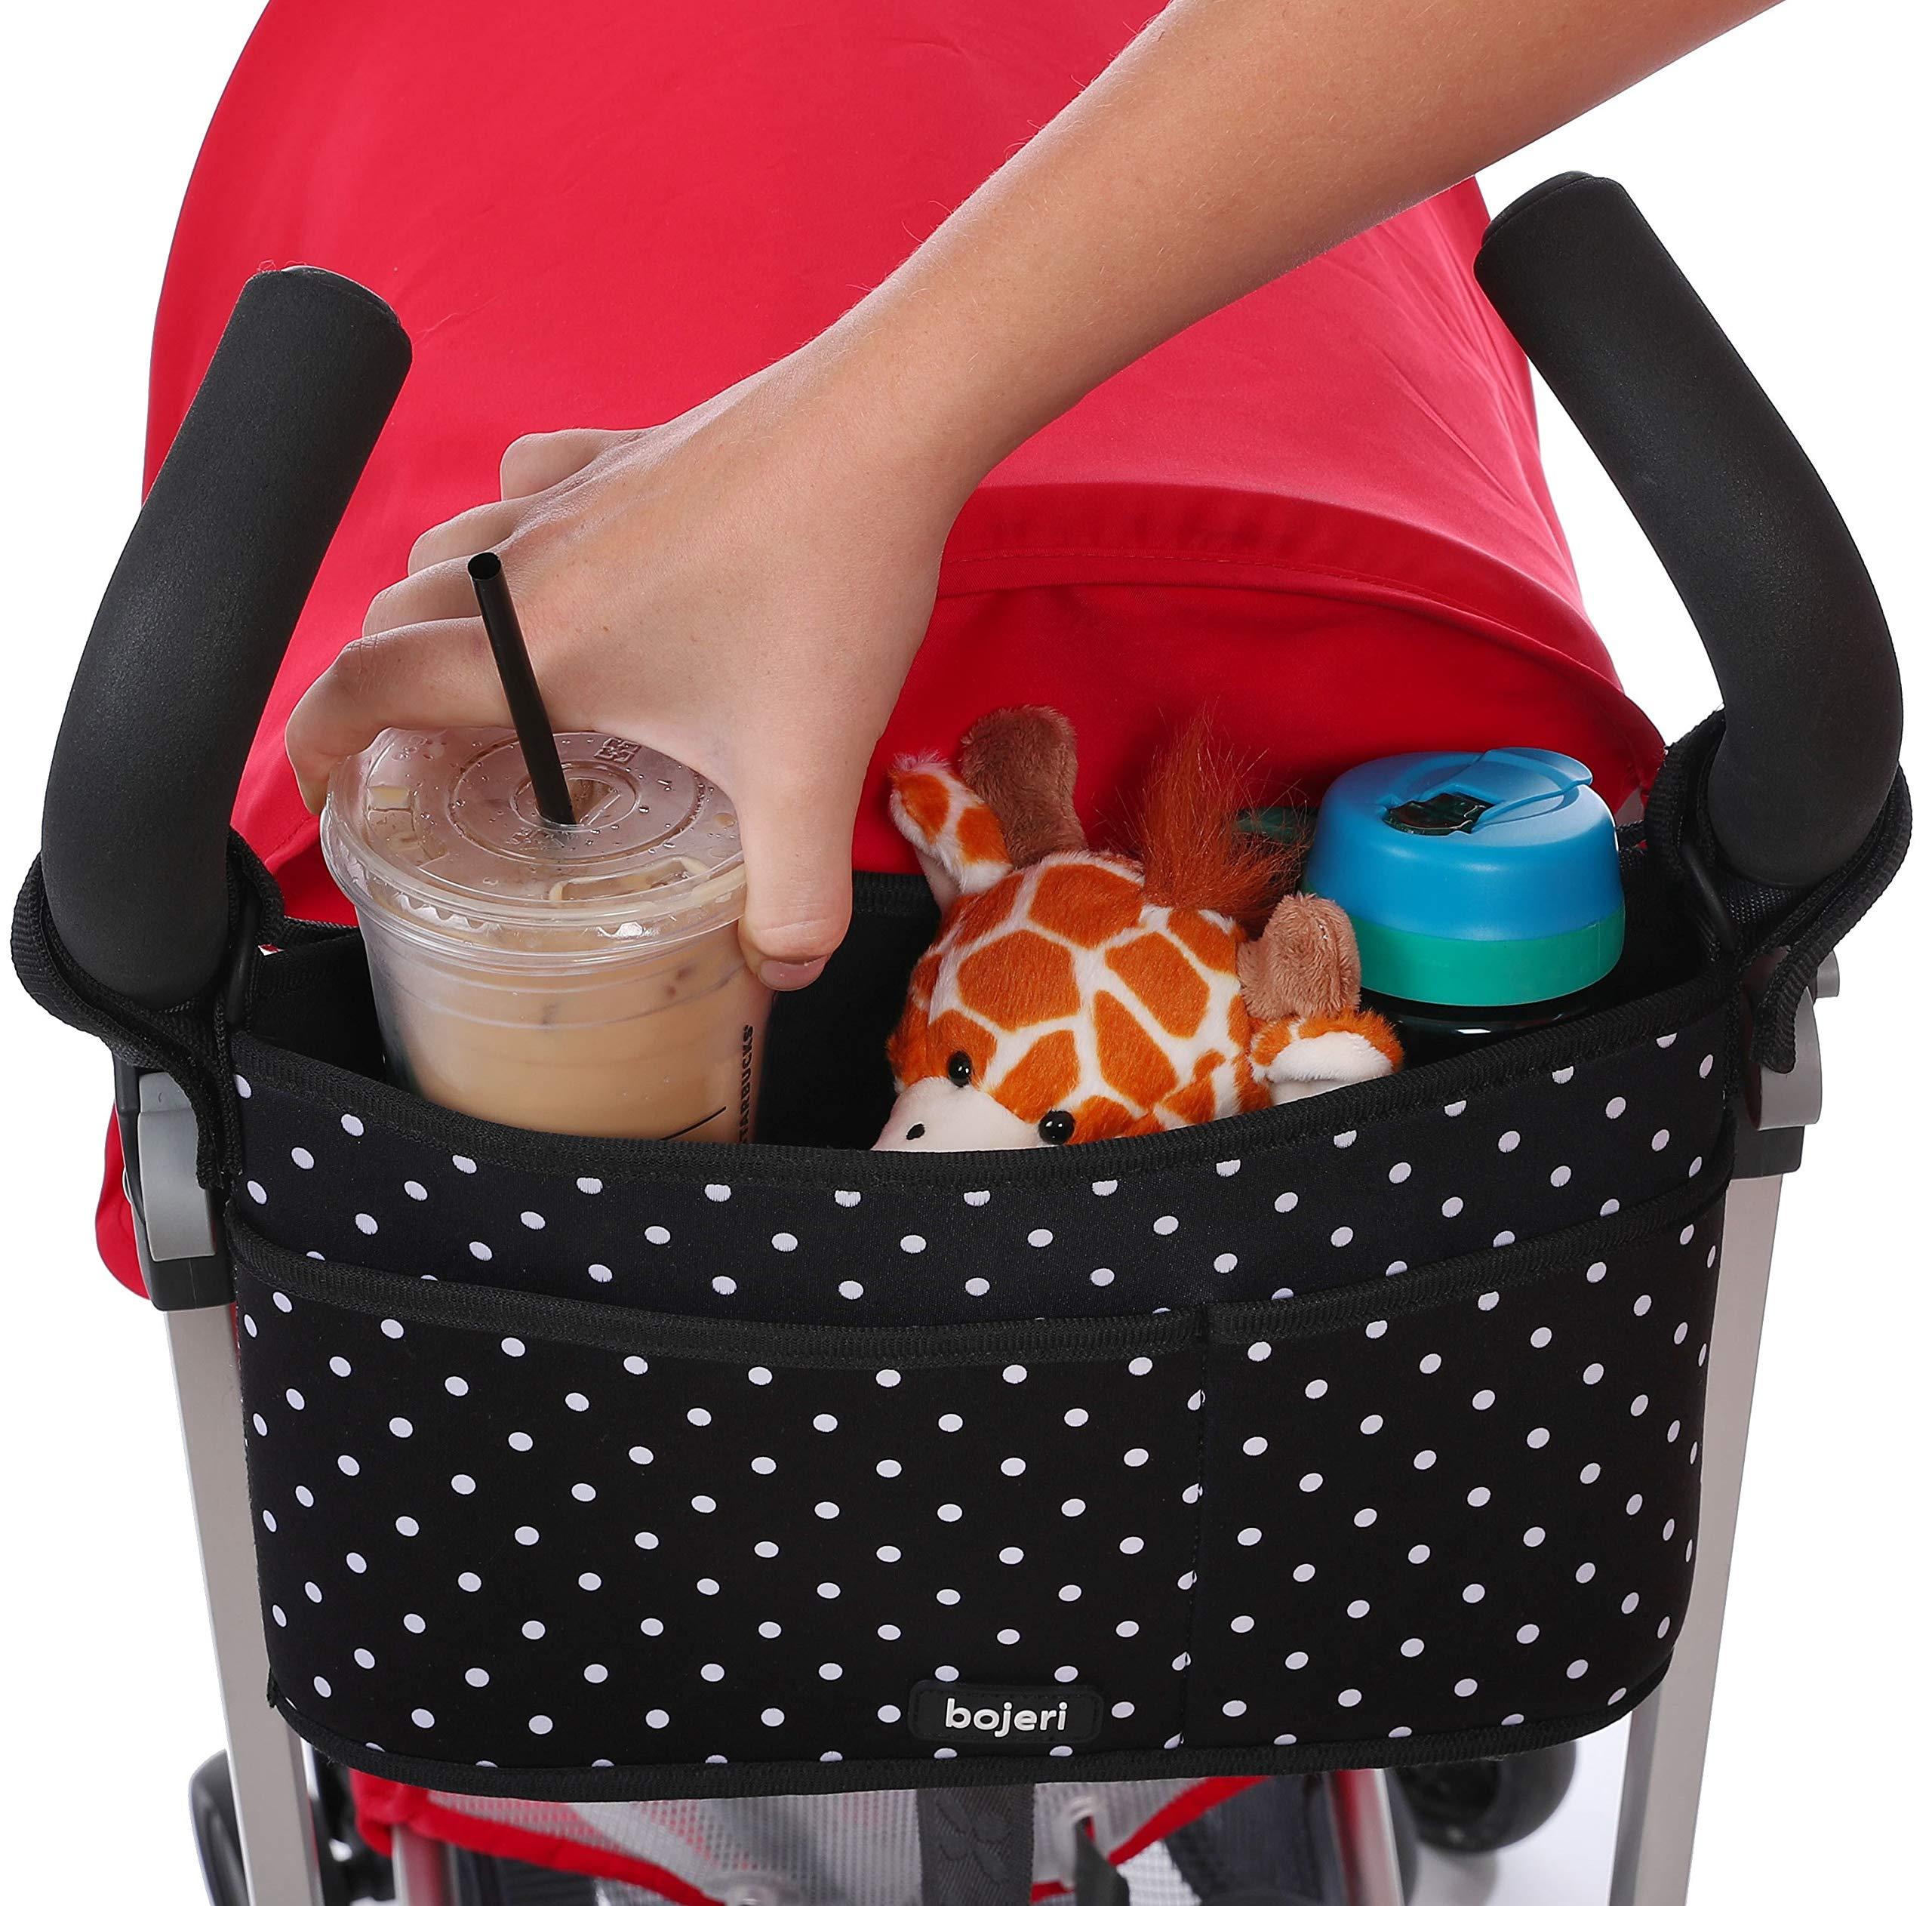 Stroller Organizer Caddy with Deep Insulated Cup Holders | Universal Fit | Stroller Storage Bag Hangs Straight | Stroller Accessory for Uppababy Vista, Cruz, City Mini, Bob, Britax, Babyzen, Bugaboo